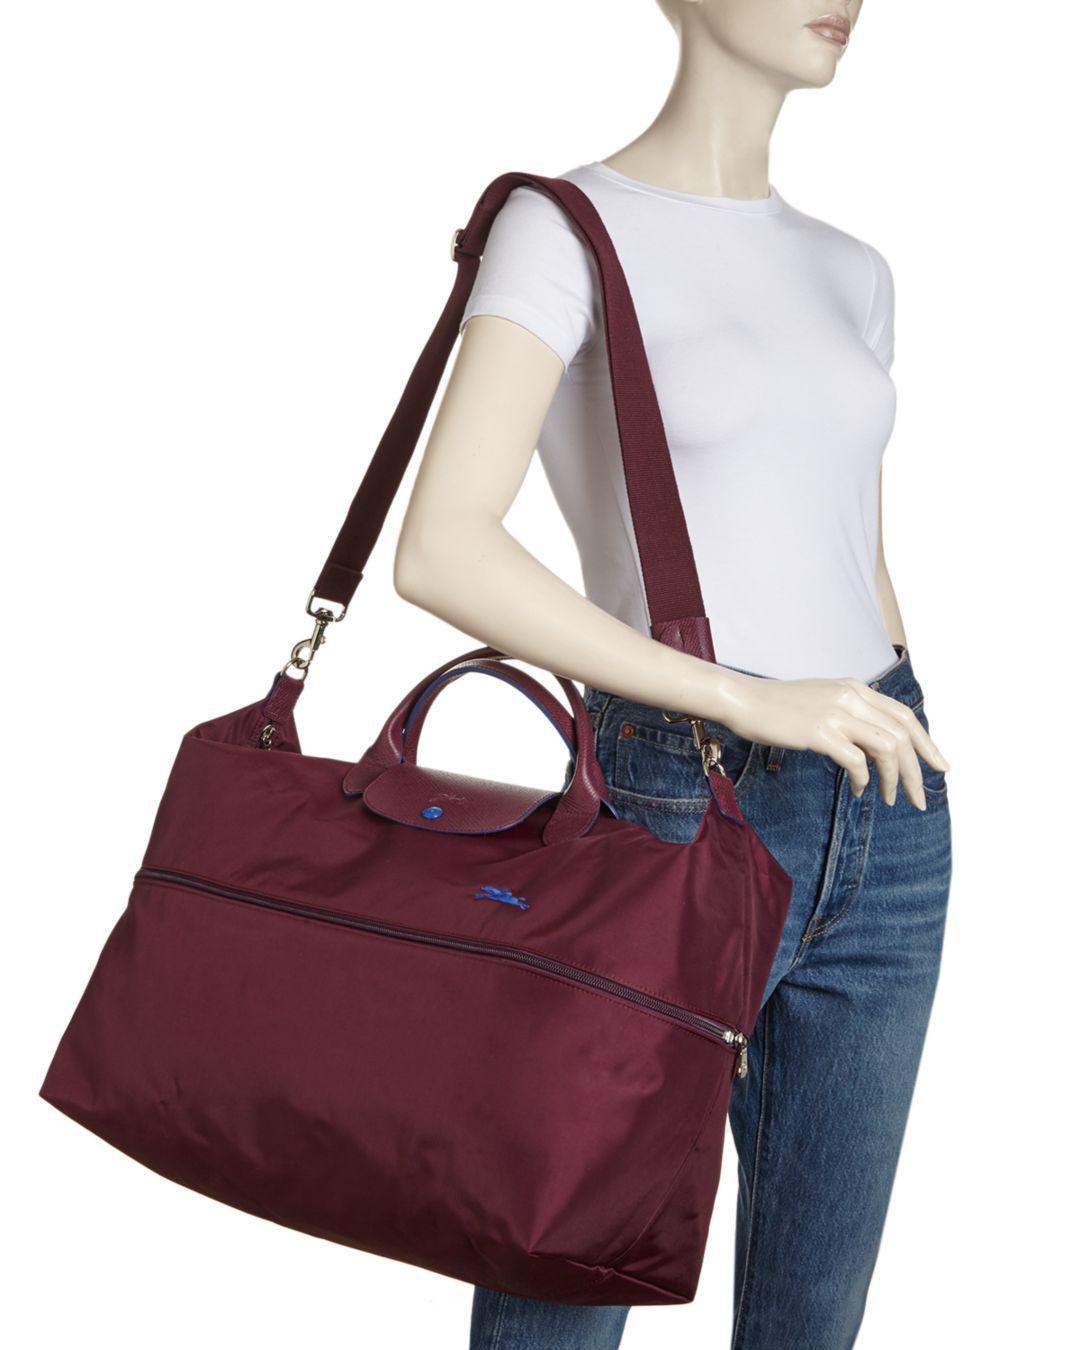 Le Pliage Club Expandable Large Nylon Travel Bag